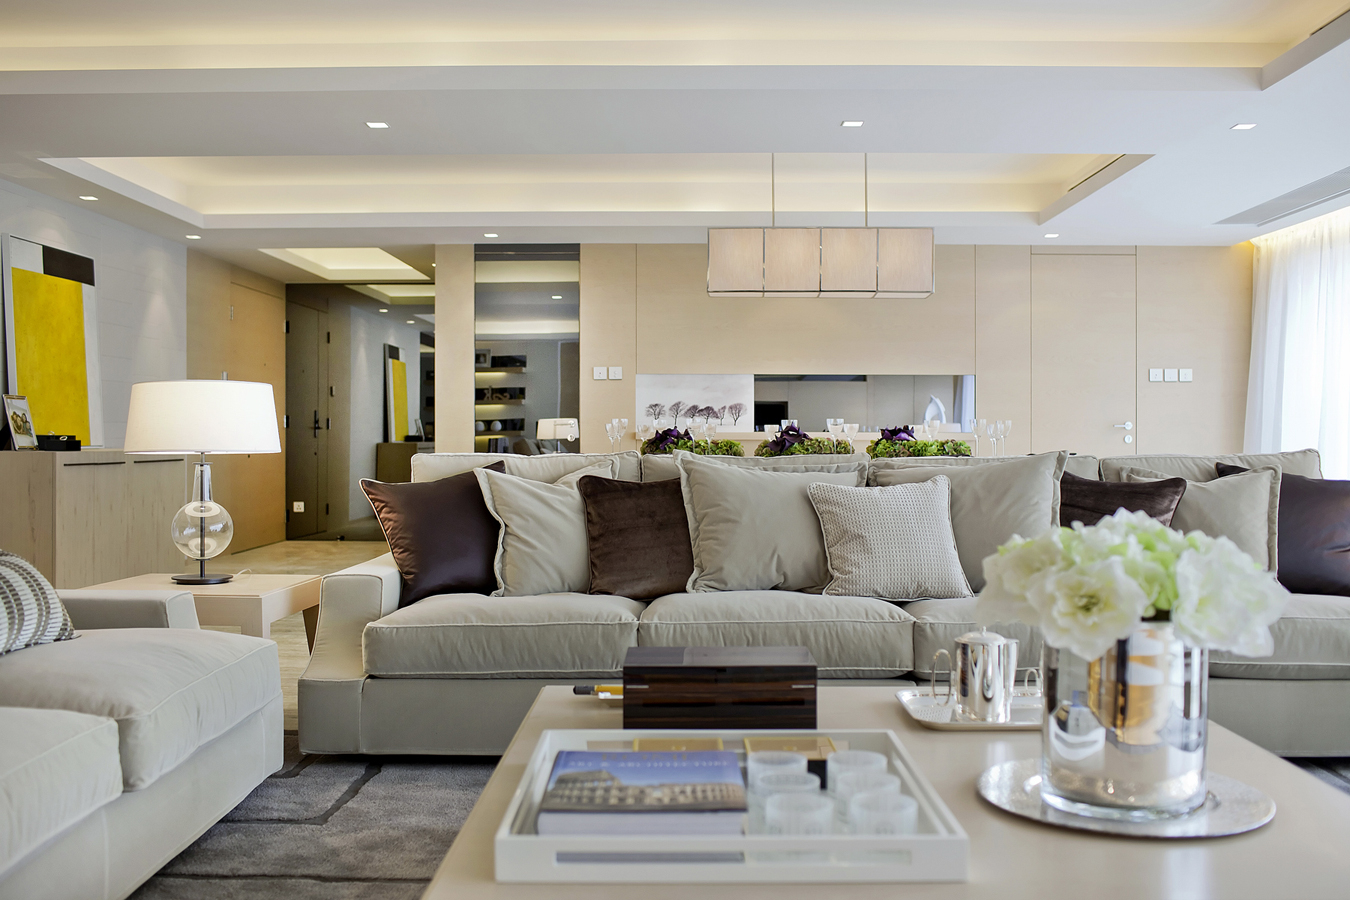 luxury interior-036.png